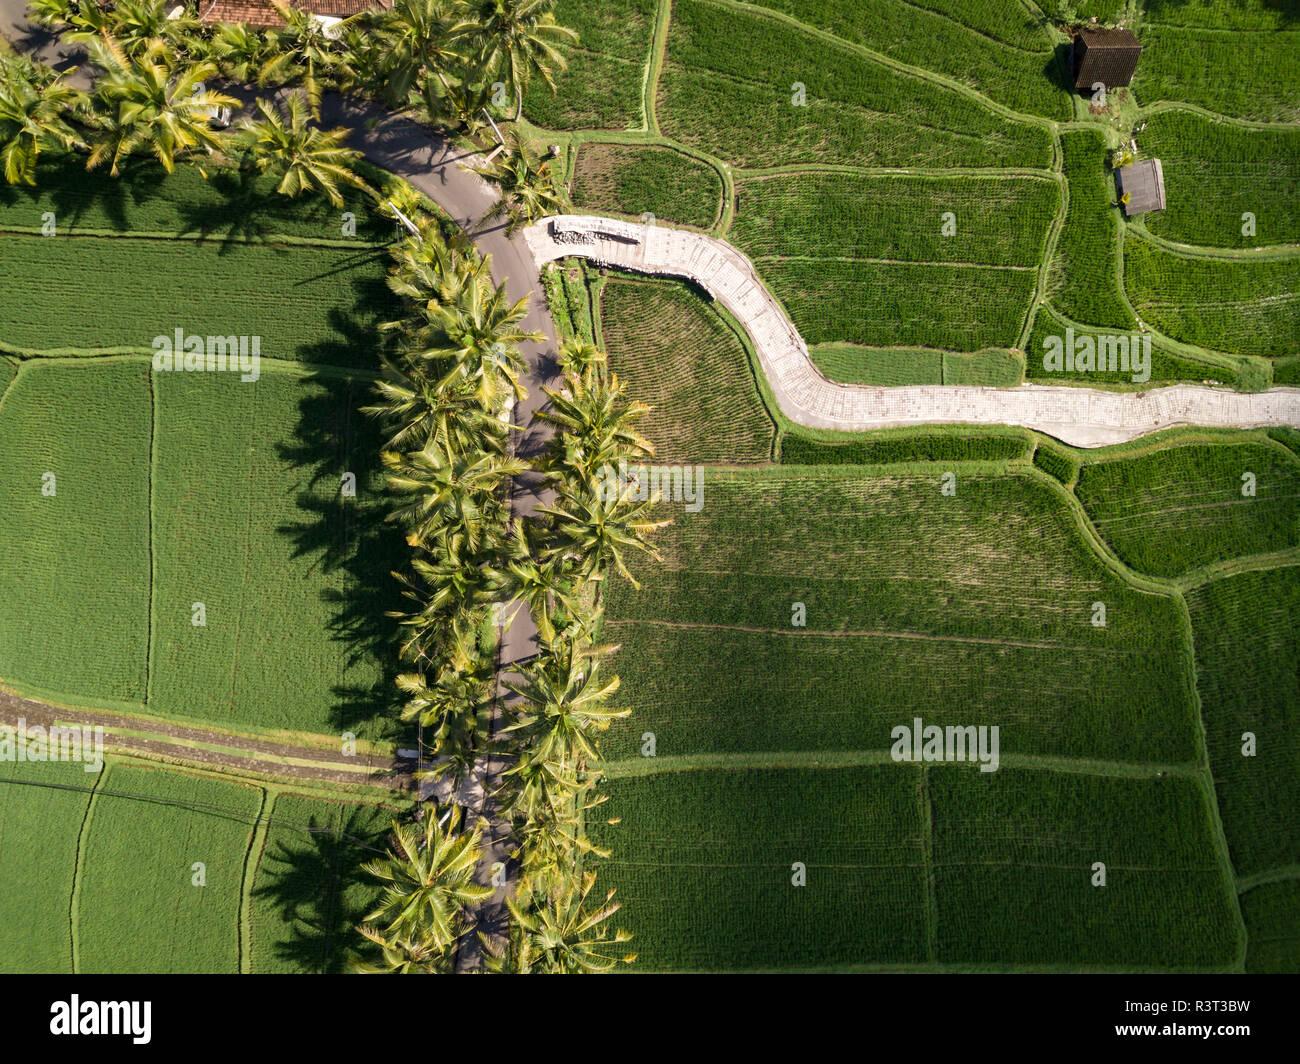 Indonesia, Bali, Ubud, Aerial view of rice fields - Stock Image